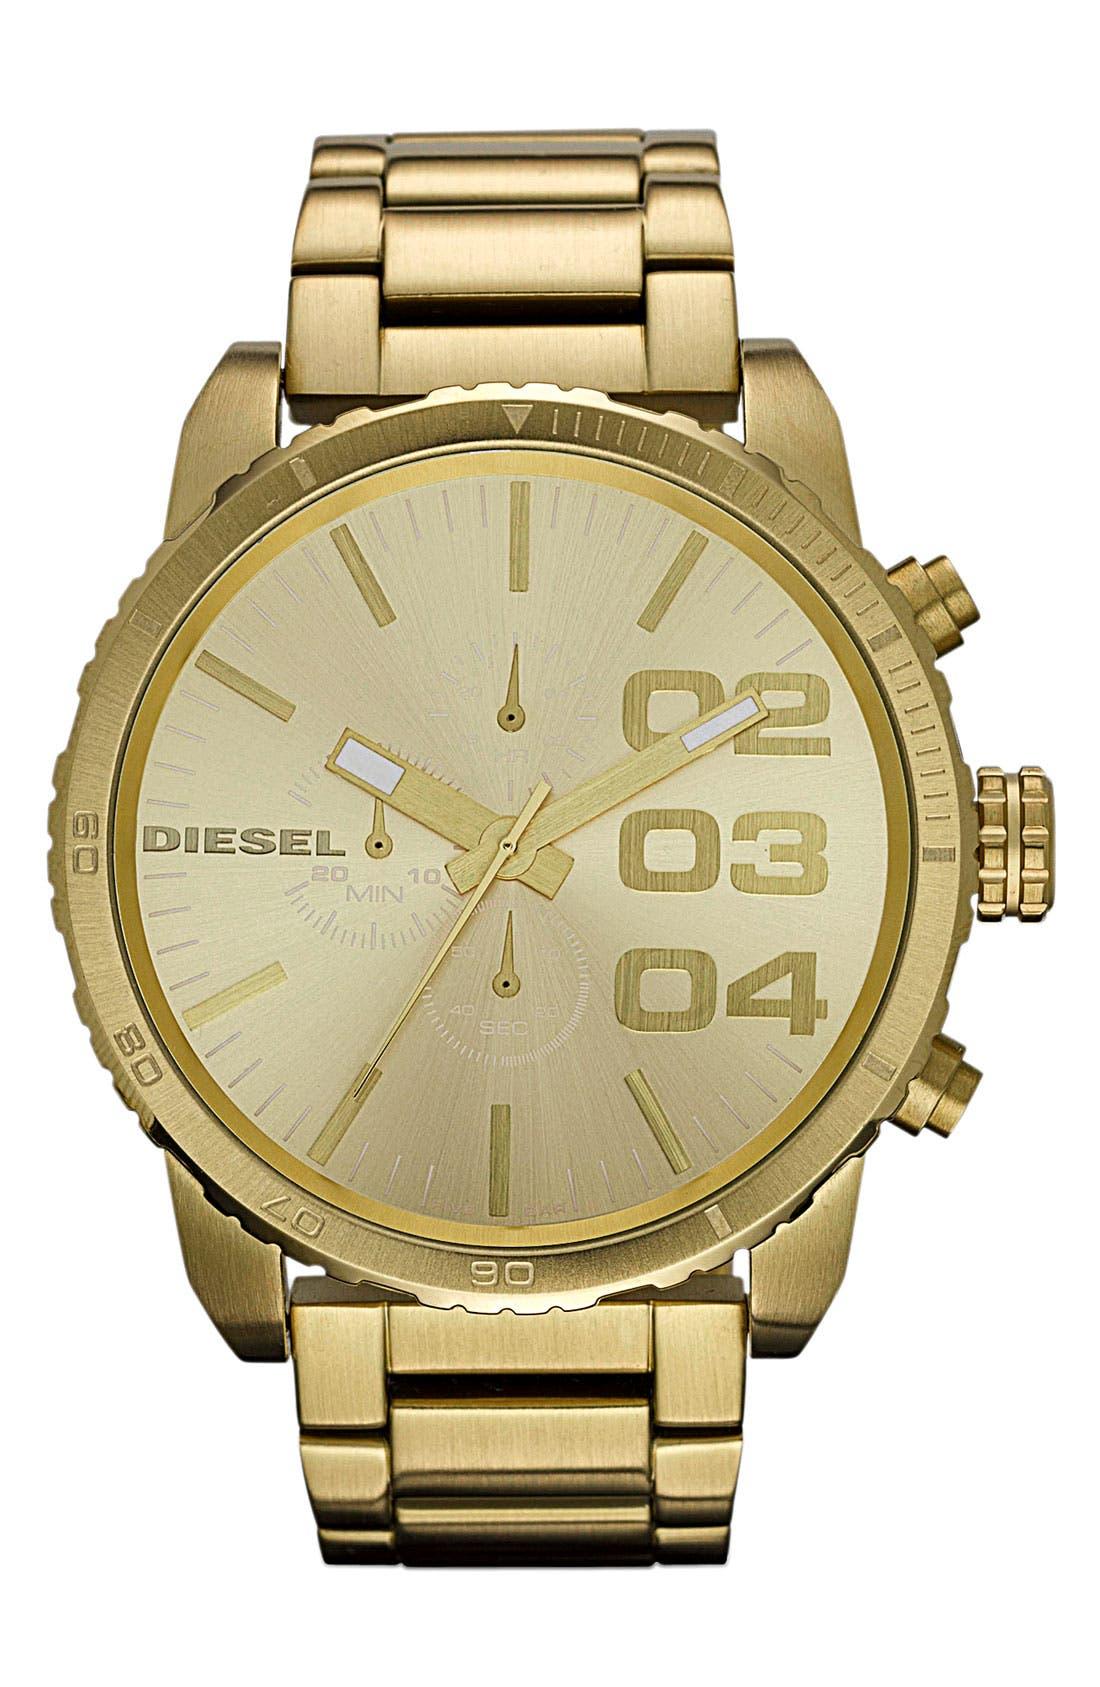 Main Image - DIESEL® 'Double Down' Large Chronograph Bracelet Watch, 52mm